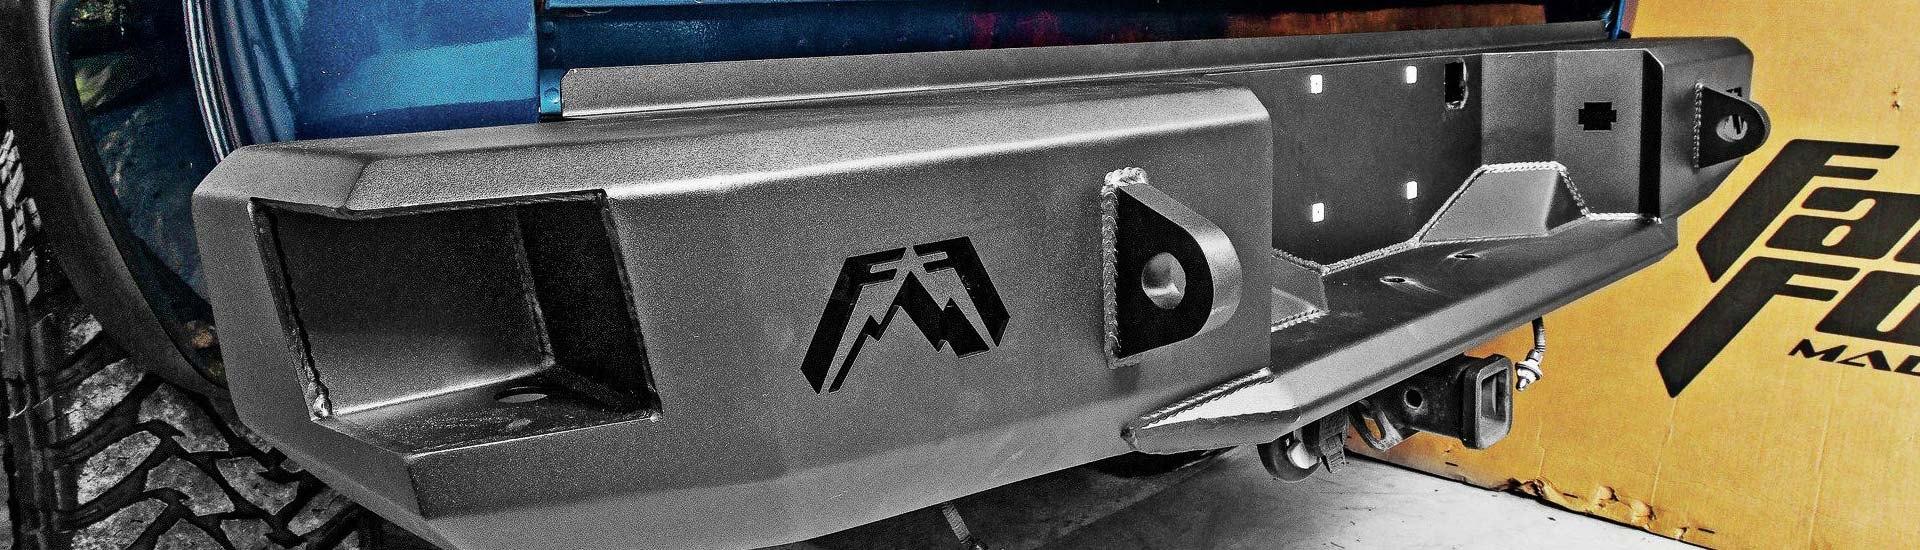 Custom 4x4 Off Road Steel Bumpers For Trucks Jeeps And Suvs Bumper Guard Honda Minivan